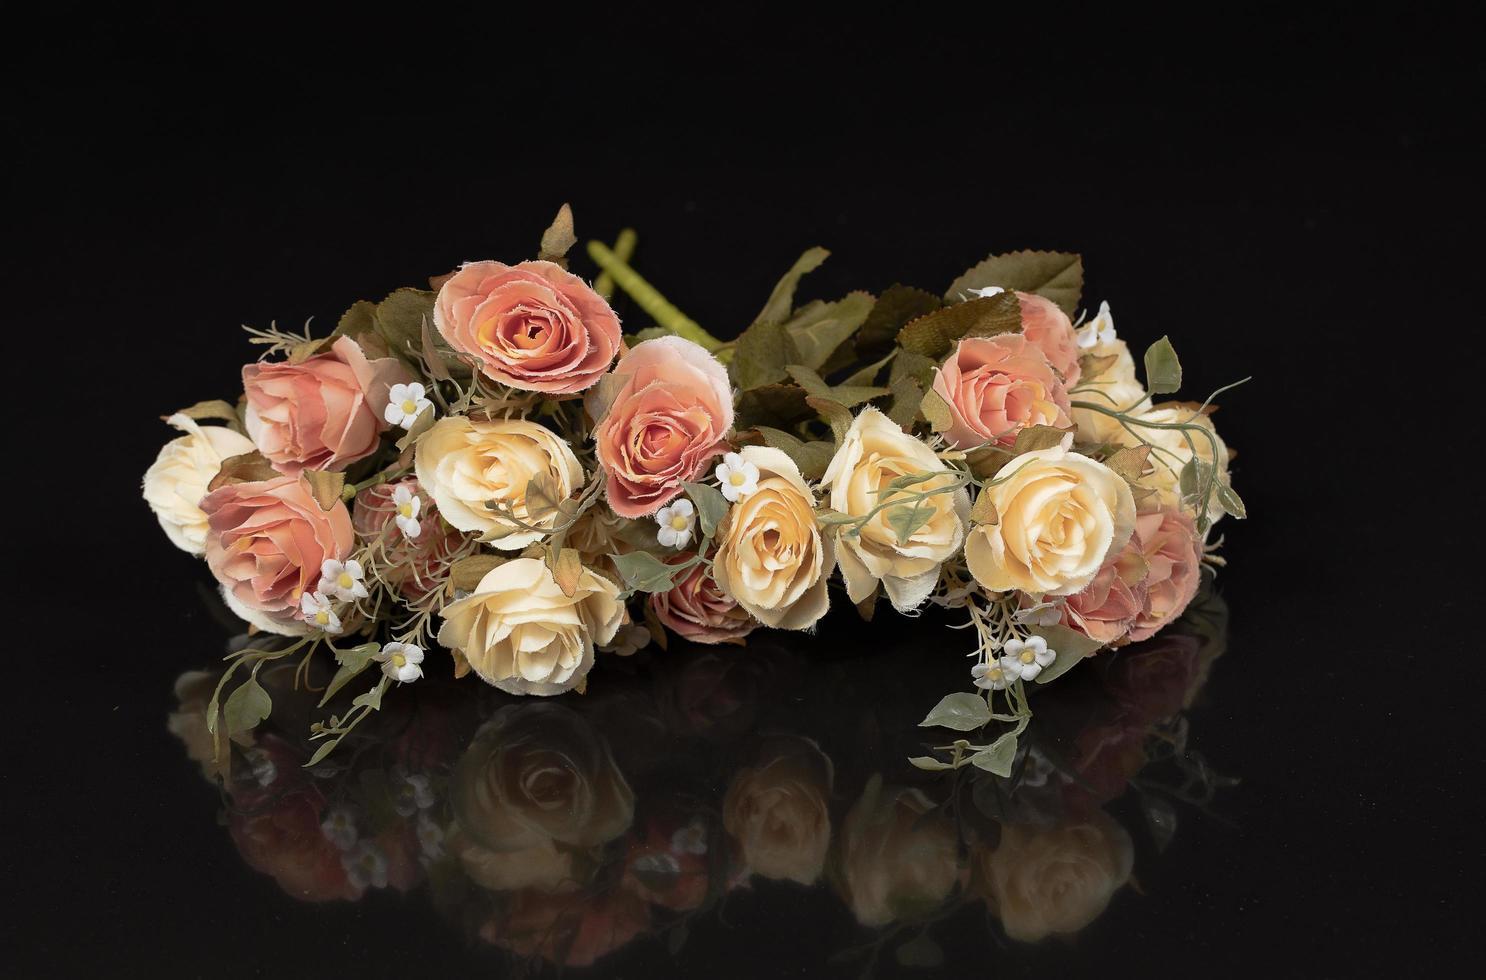 Decoration of vintage flowers on a black background photo